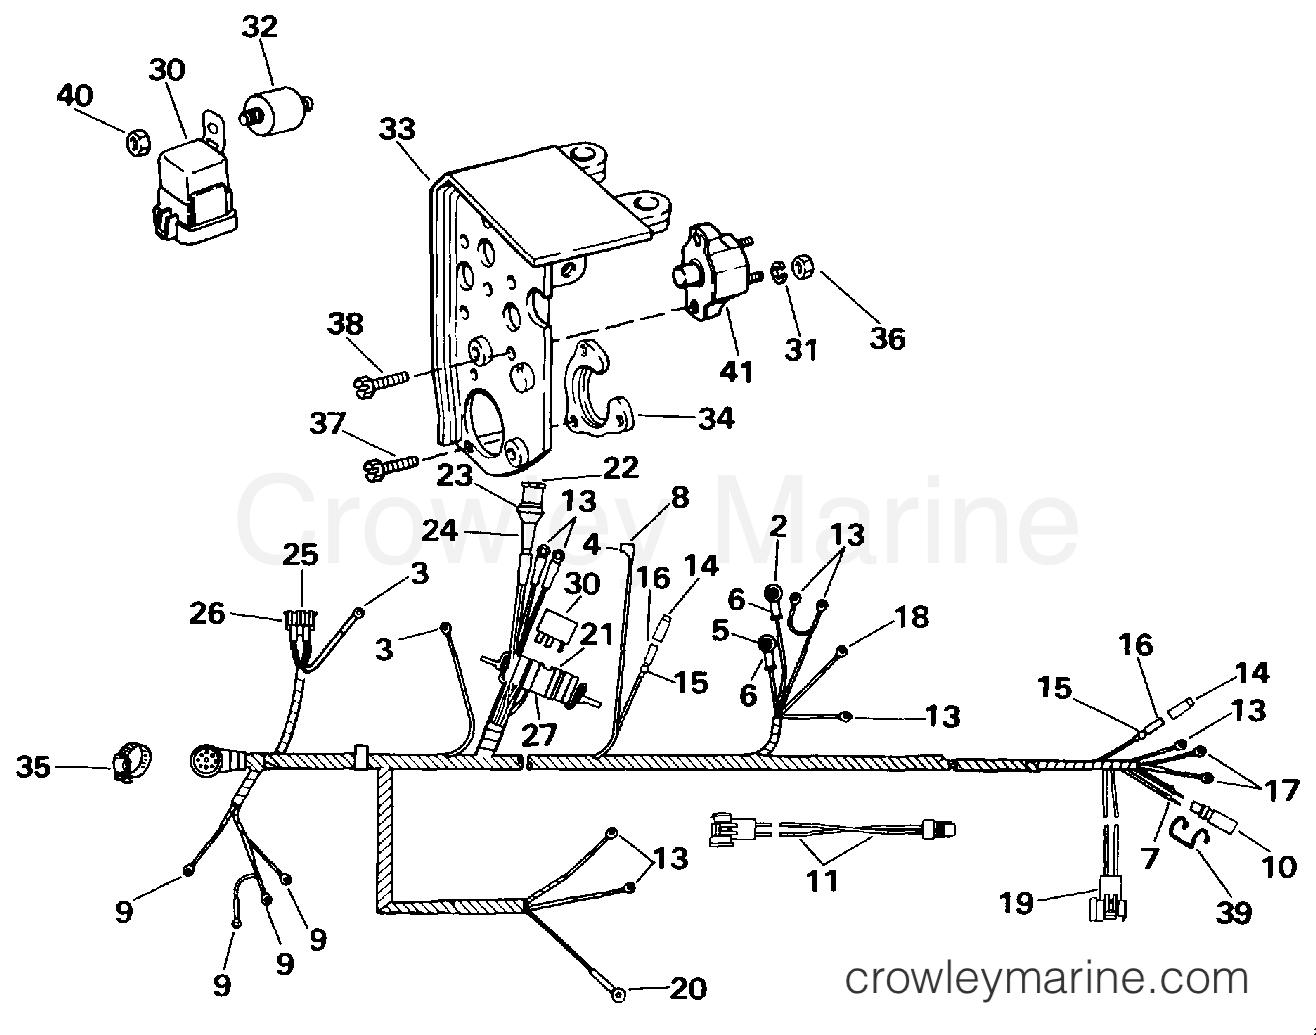 1994 omc stern drive 4 3 - 432acmmda - engine wire harness & shift module  section